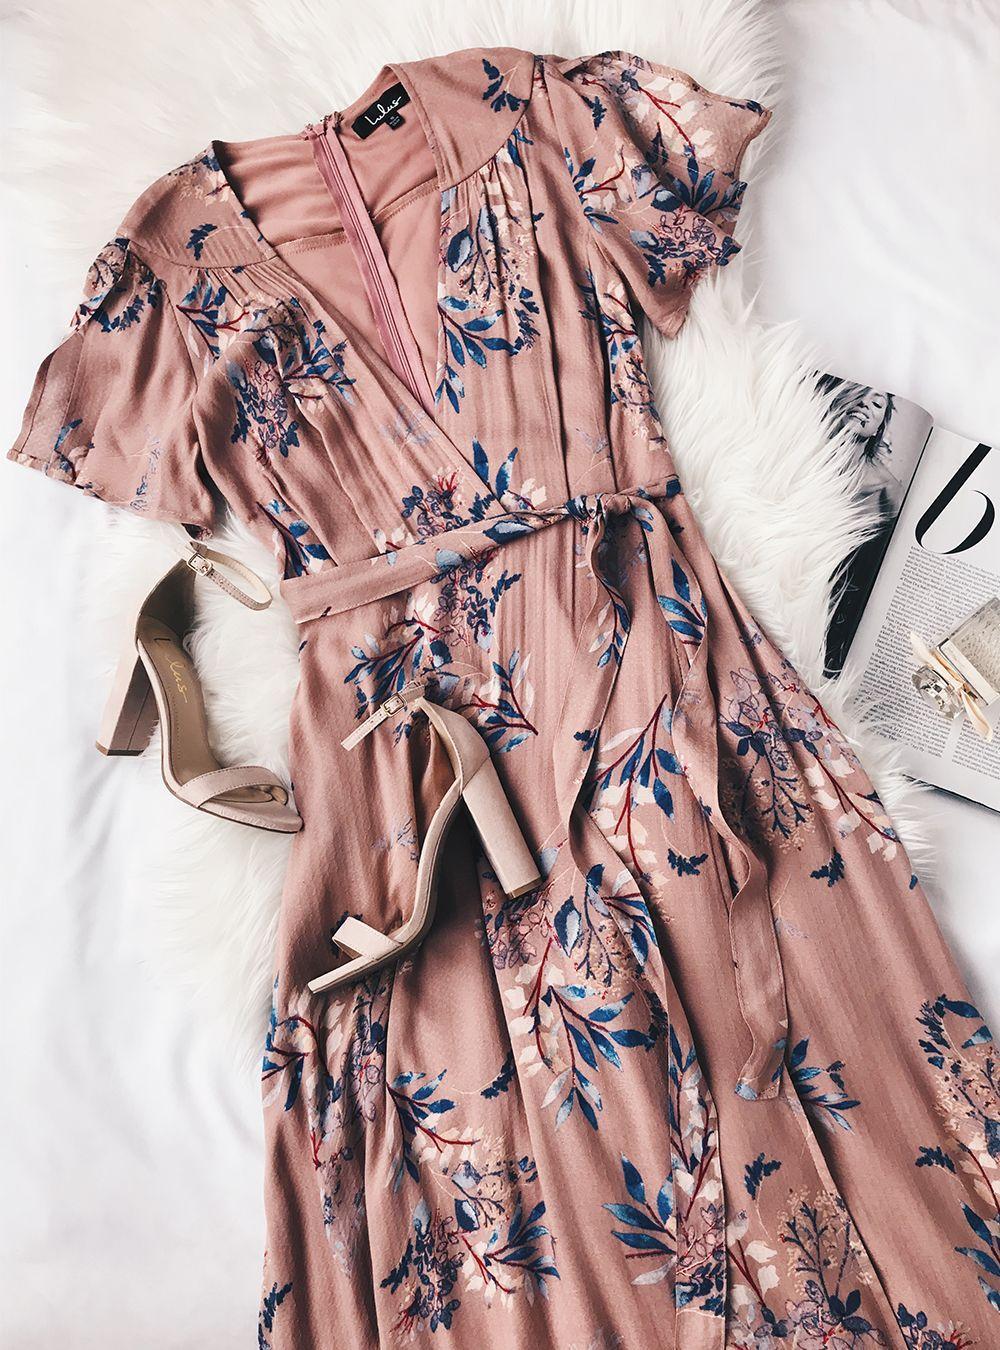 Lovelulus print and floral dress clothe womenus fashion outfit